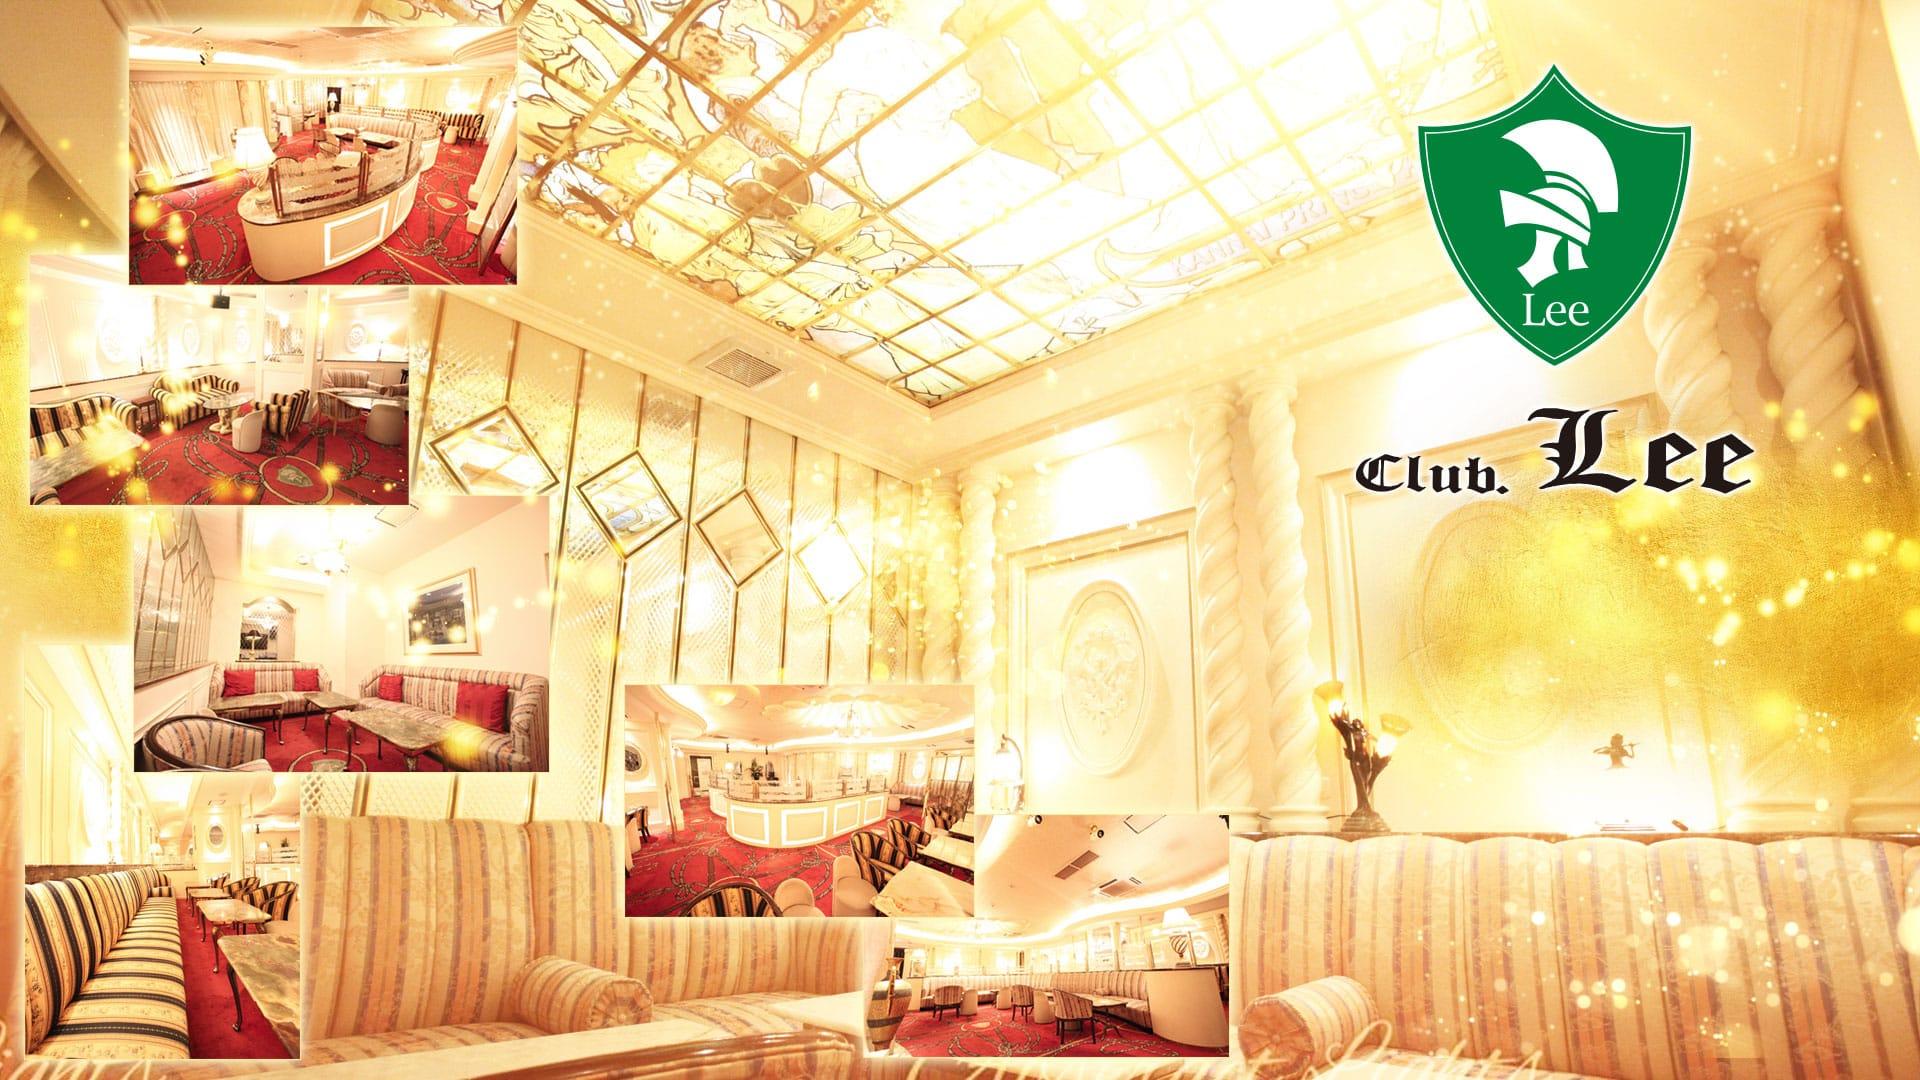 Club Lee[クラブリー] 関内 キャバクラ TOP画像